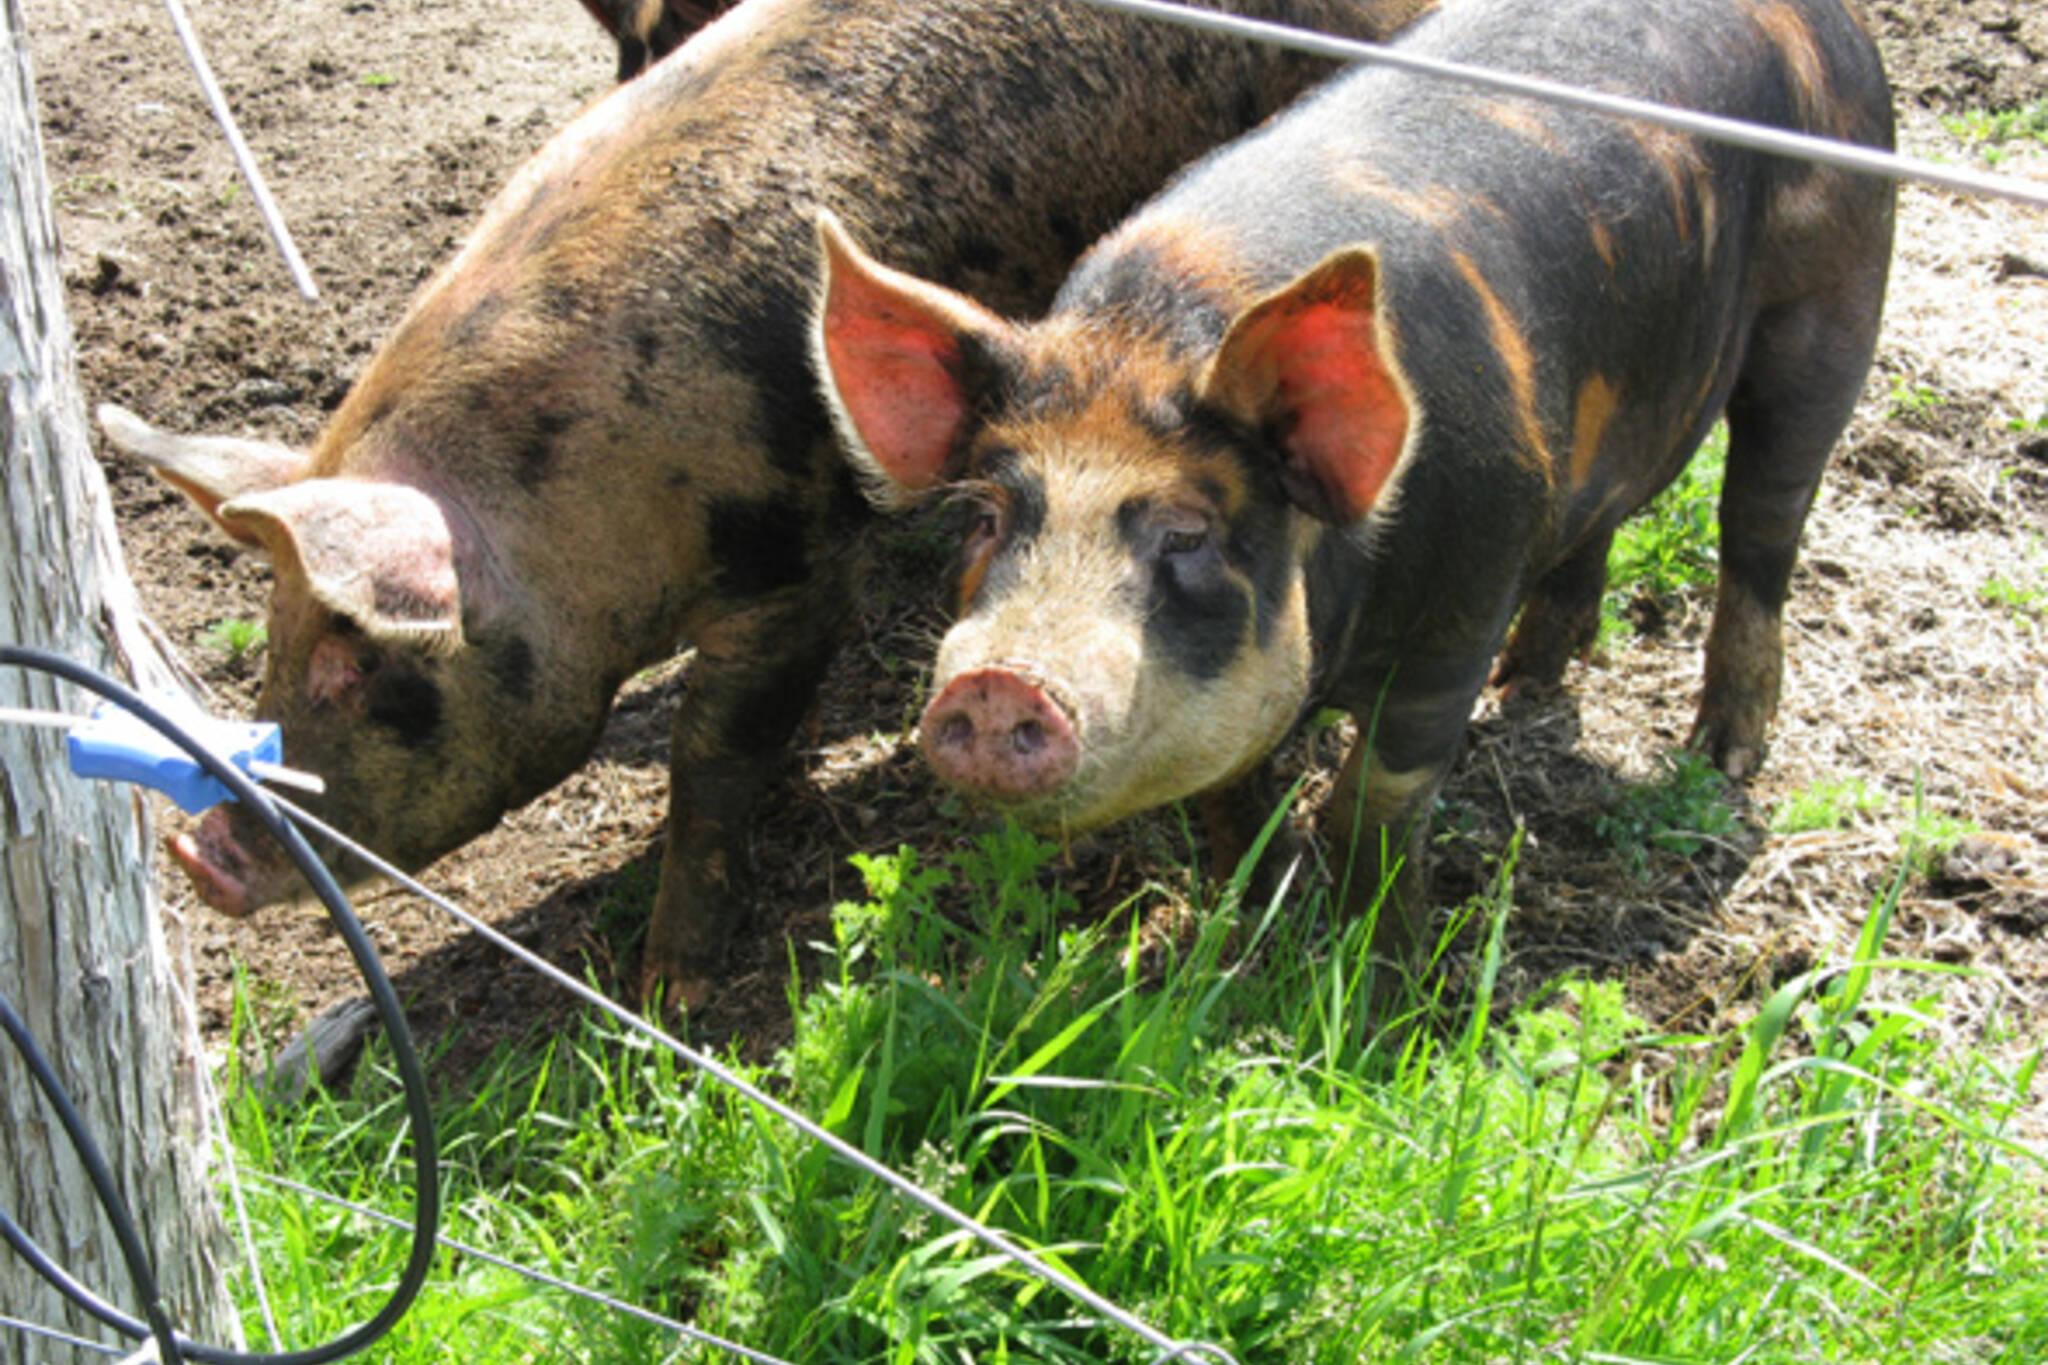 Stoddart Farm Pigs